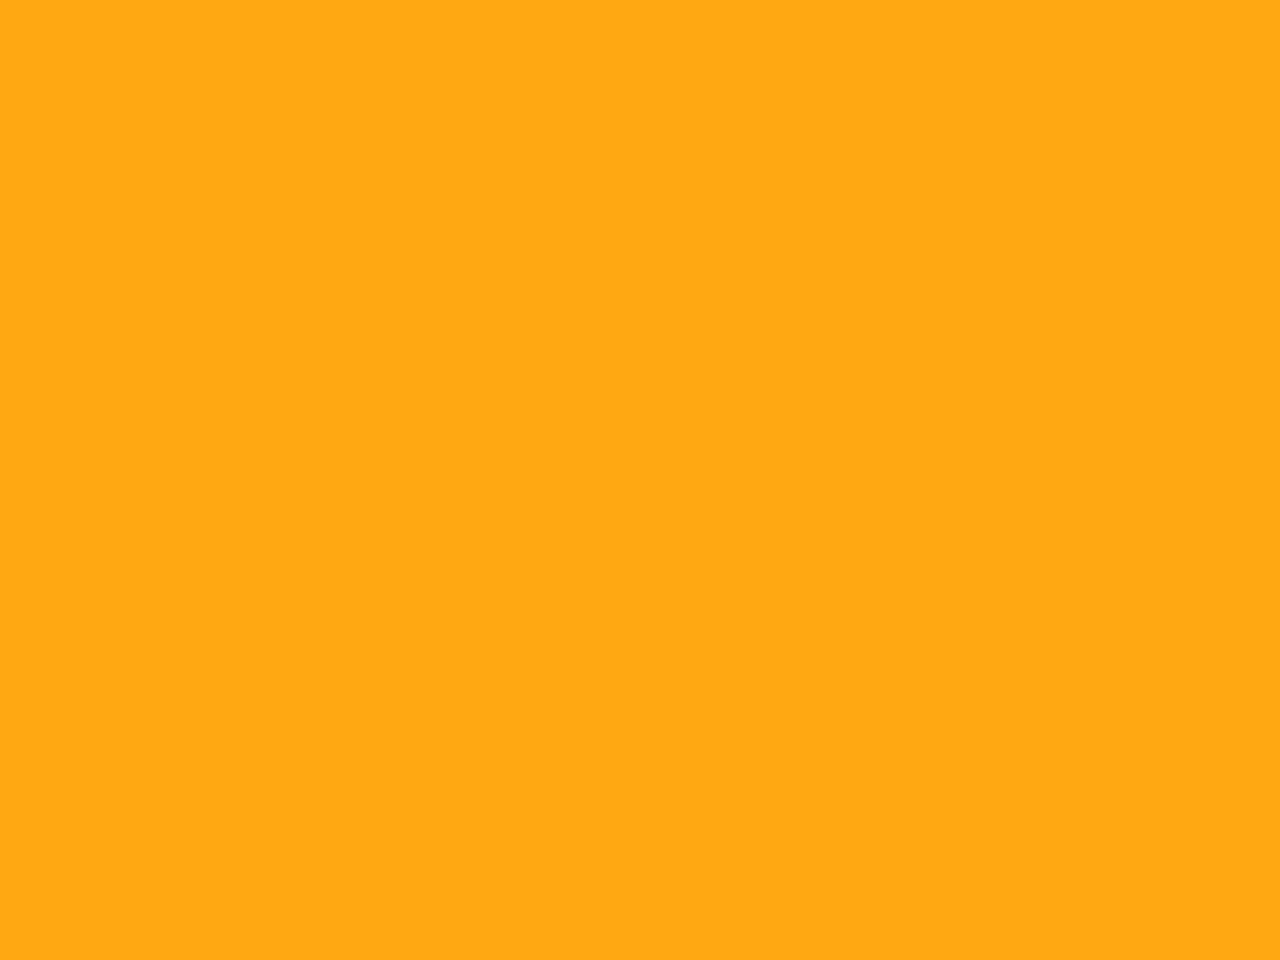 1280x960 Dark Tangerine Solid Color Background